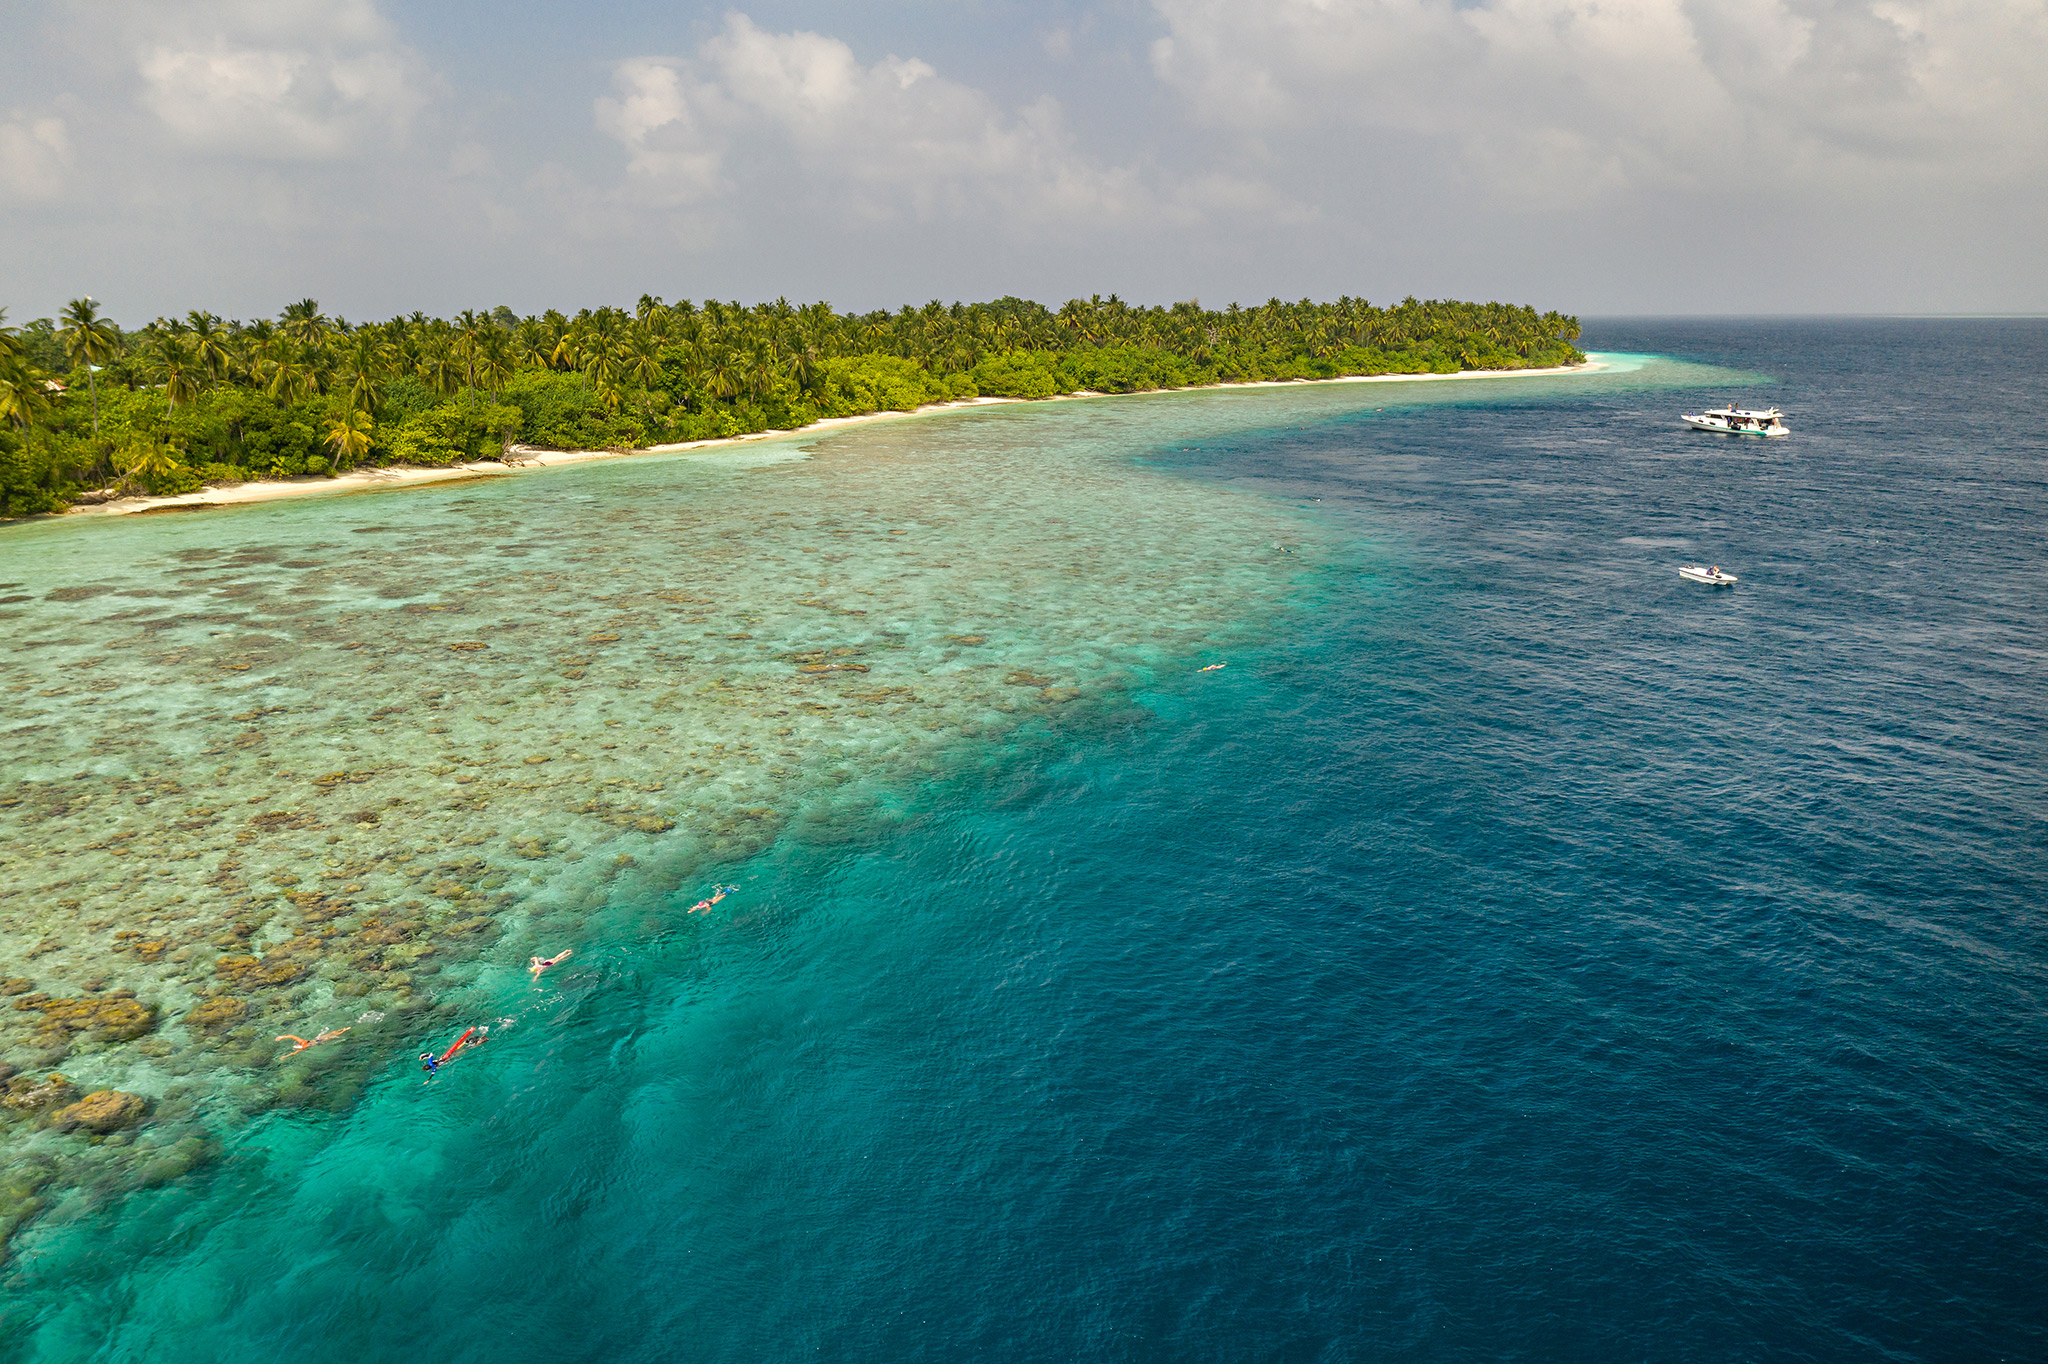 Maldives Swimming Holiday - liveaboard the MS Emperor Virgo